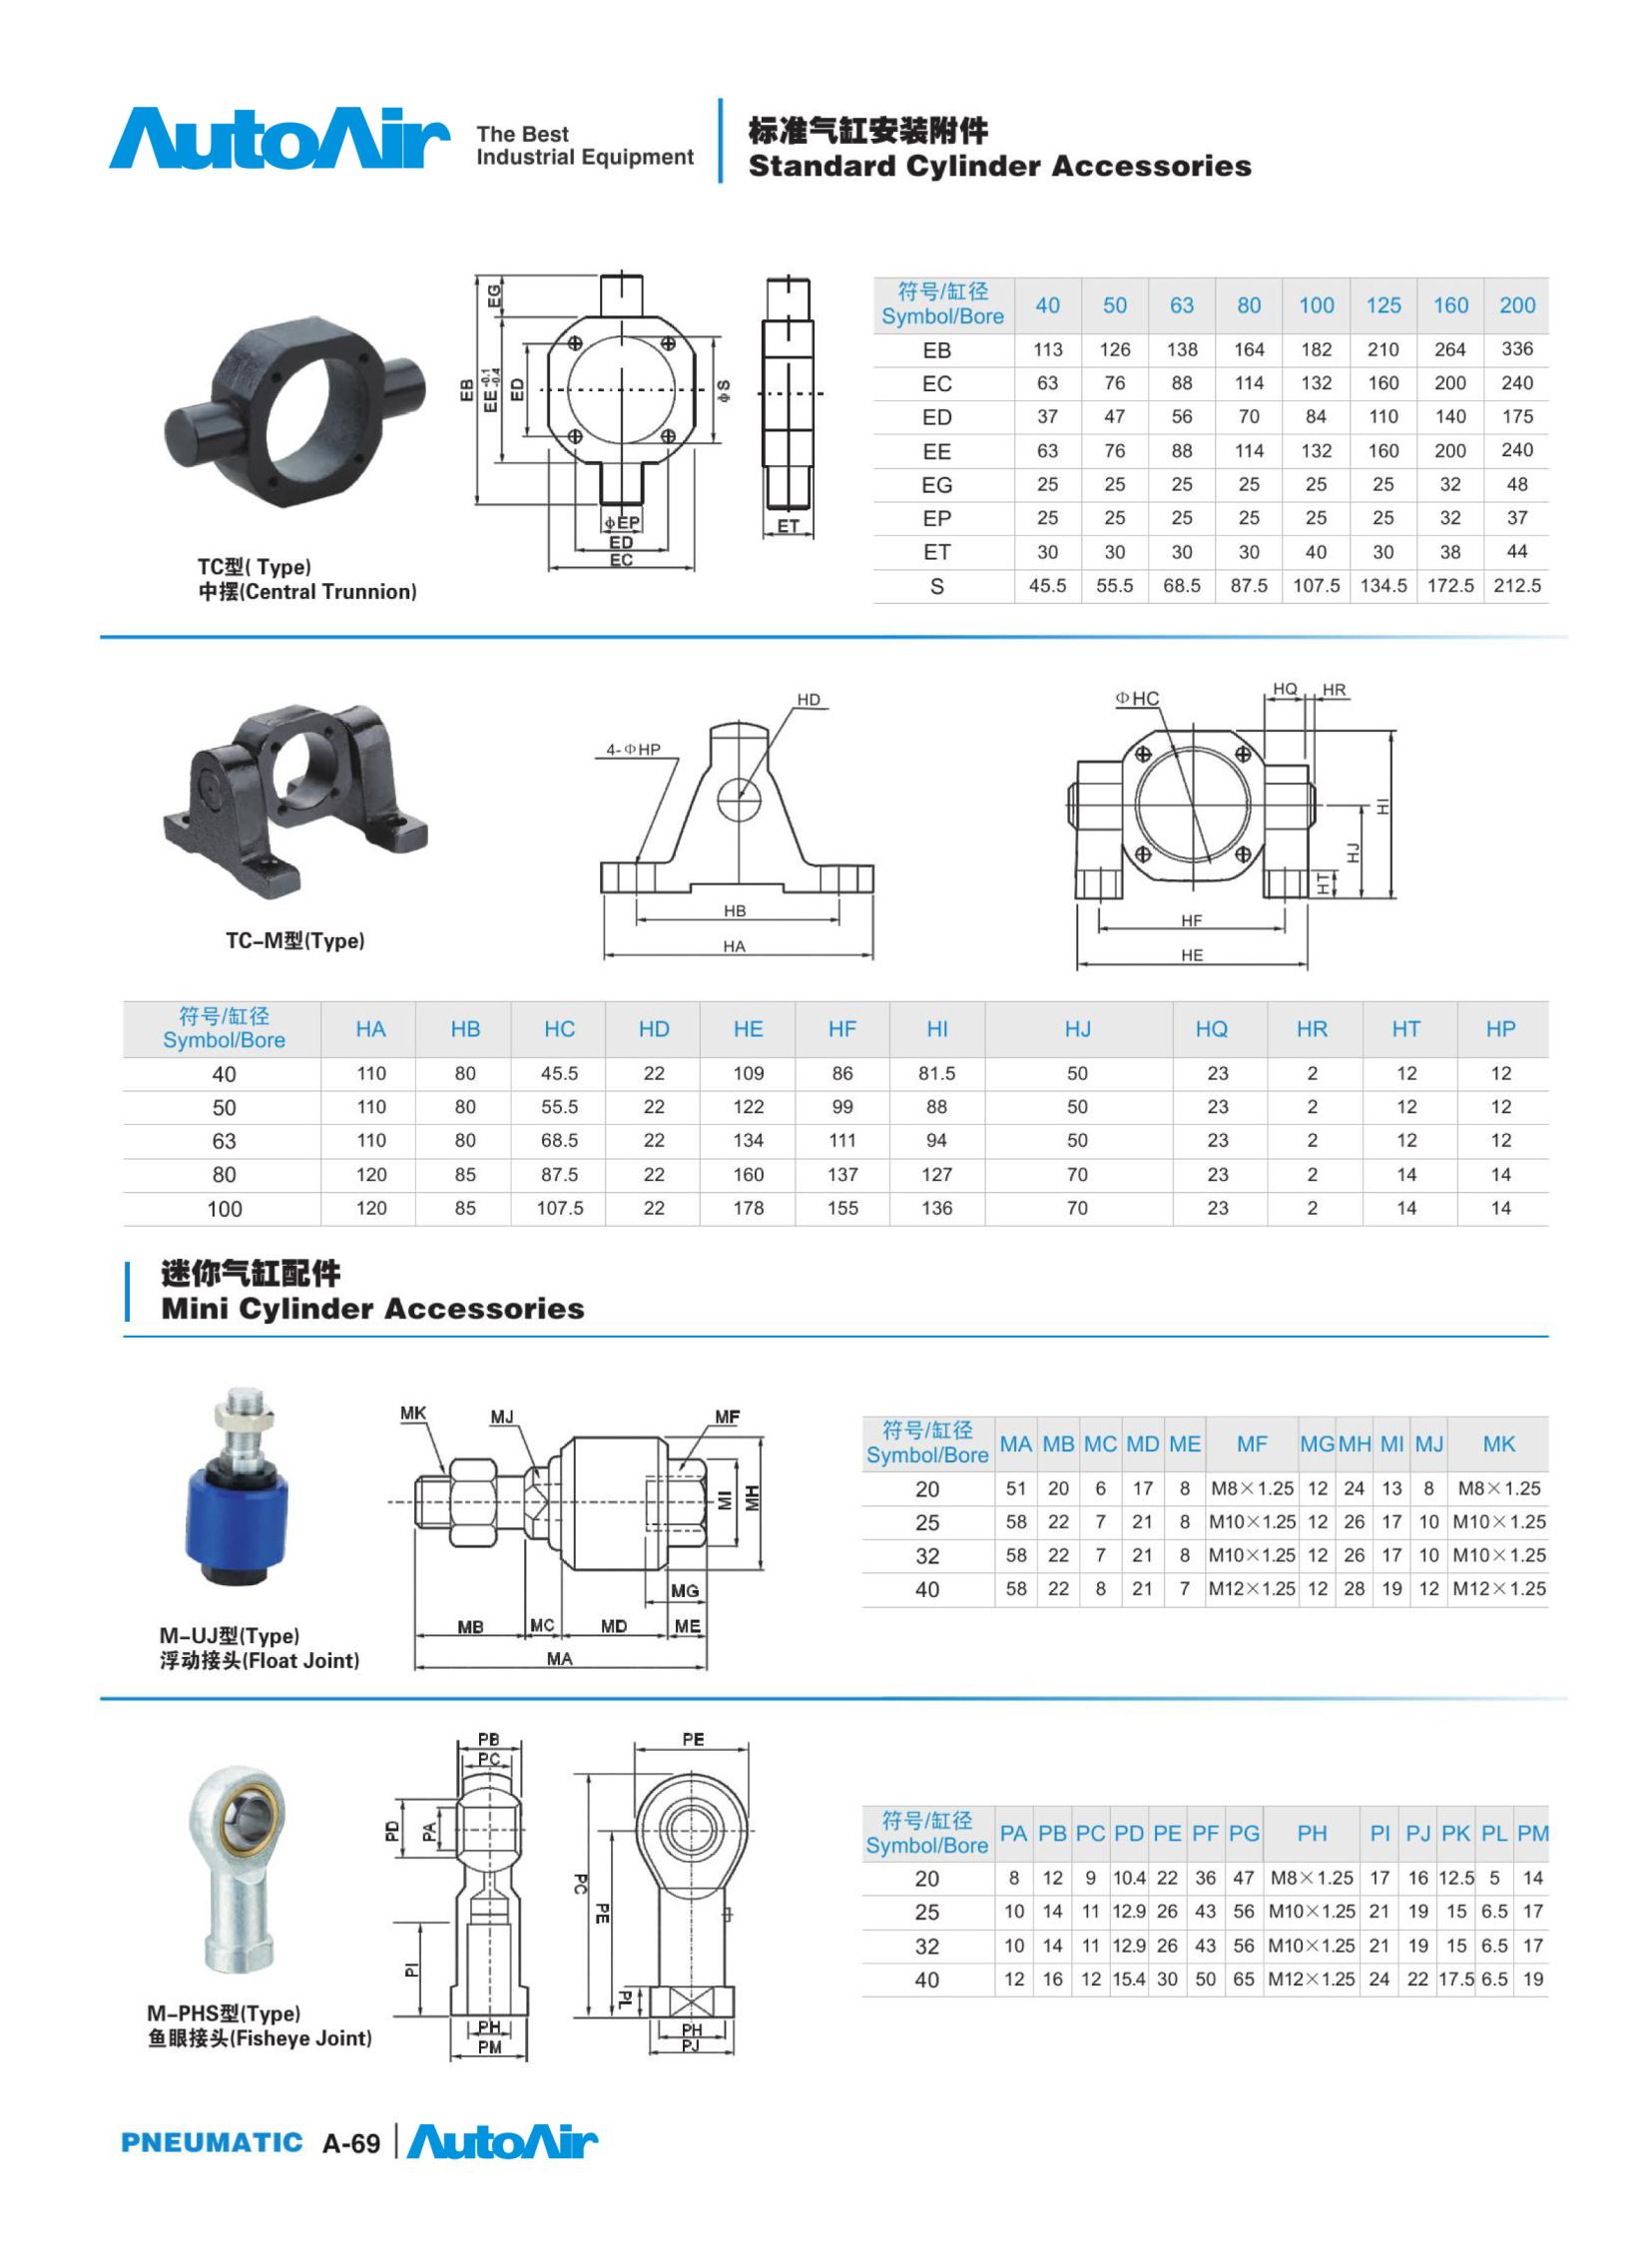 pneumatic cylinder(69)